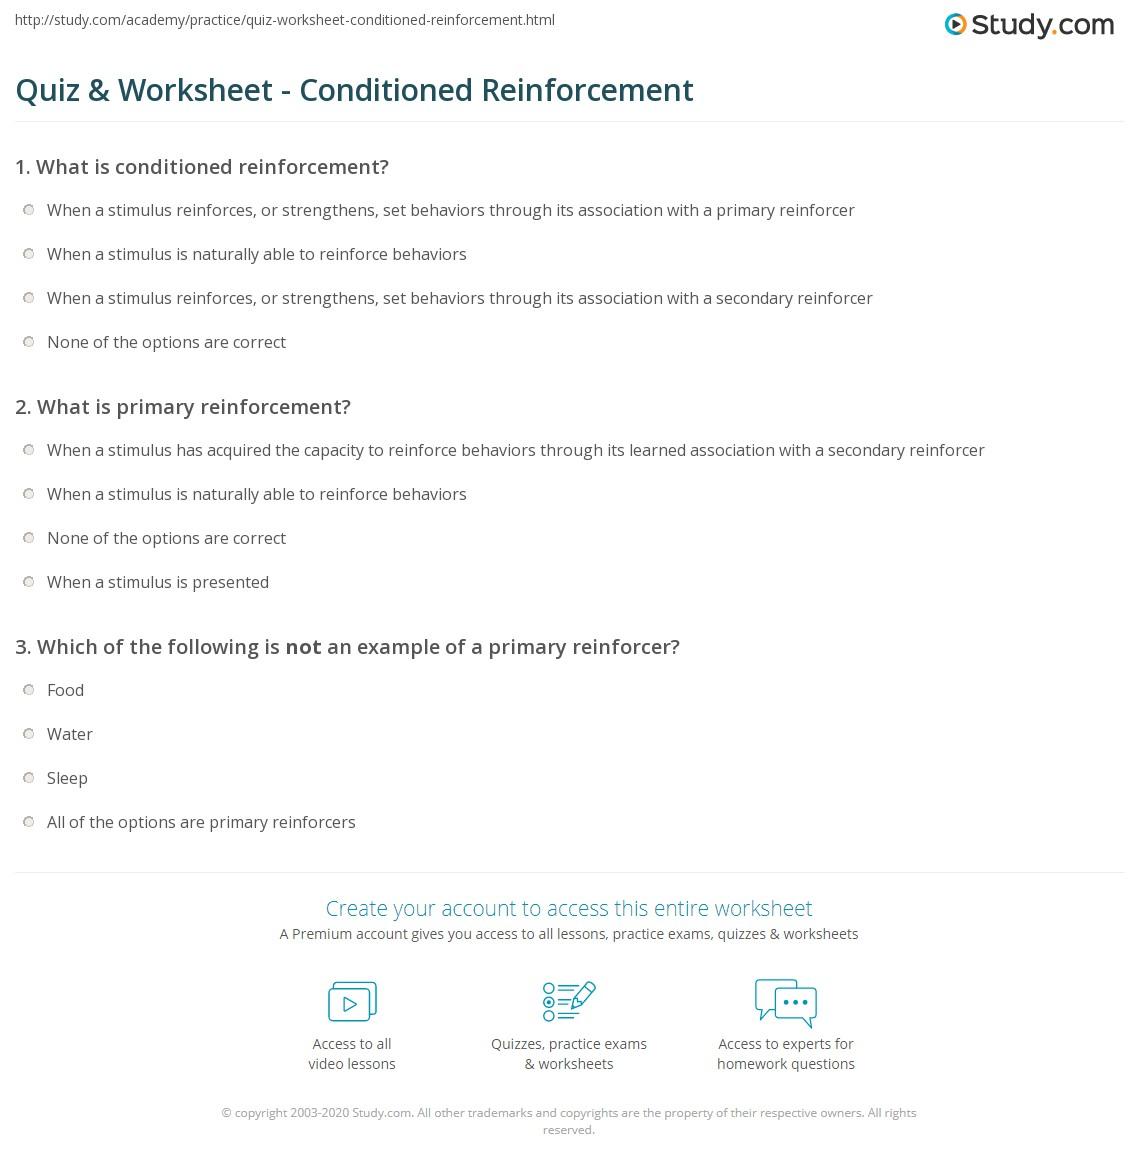 Quiz & Worksheet - Conditioned Reinforcement   Study.com